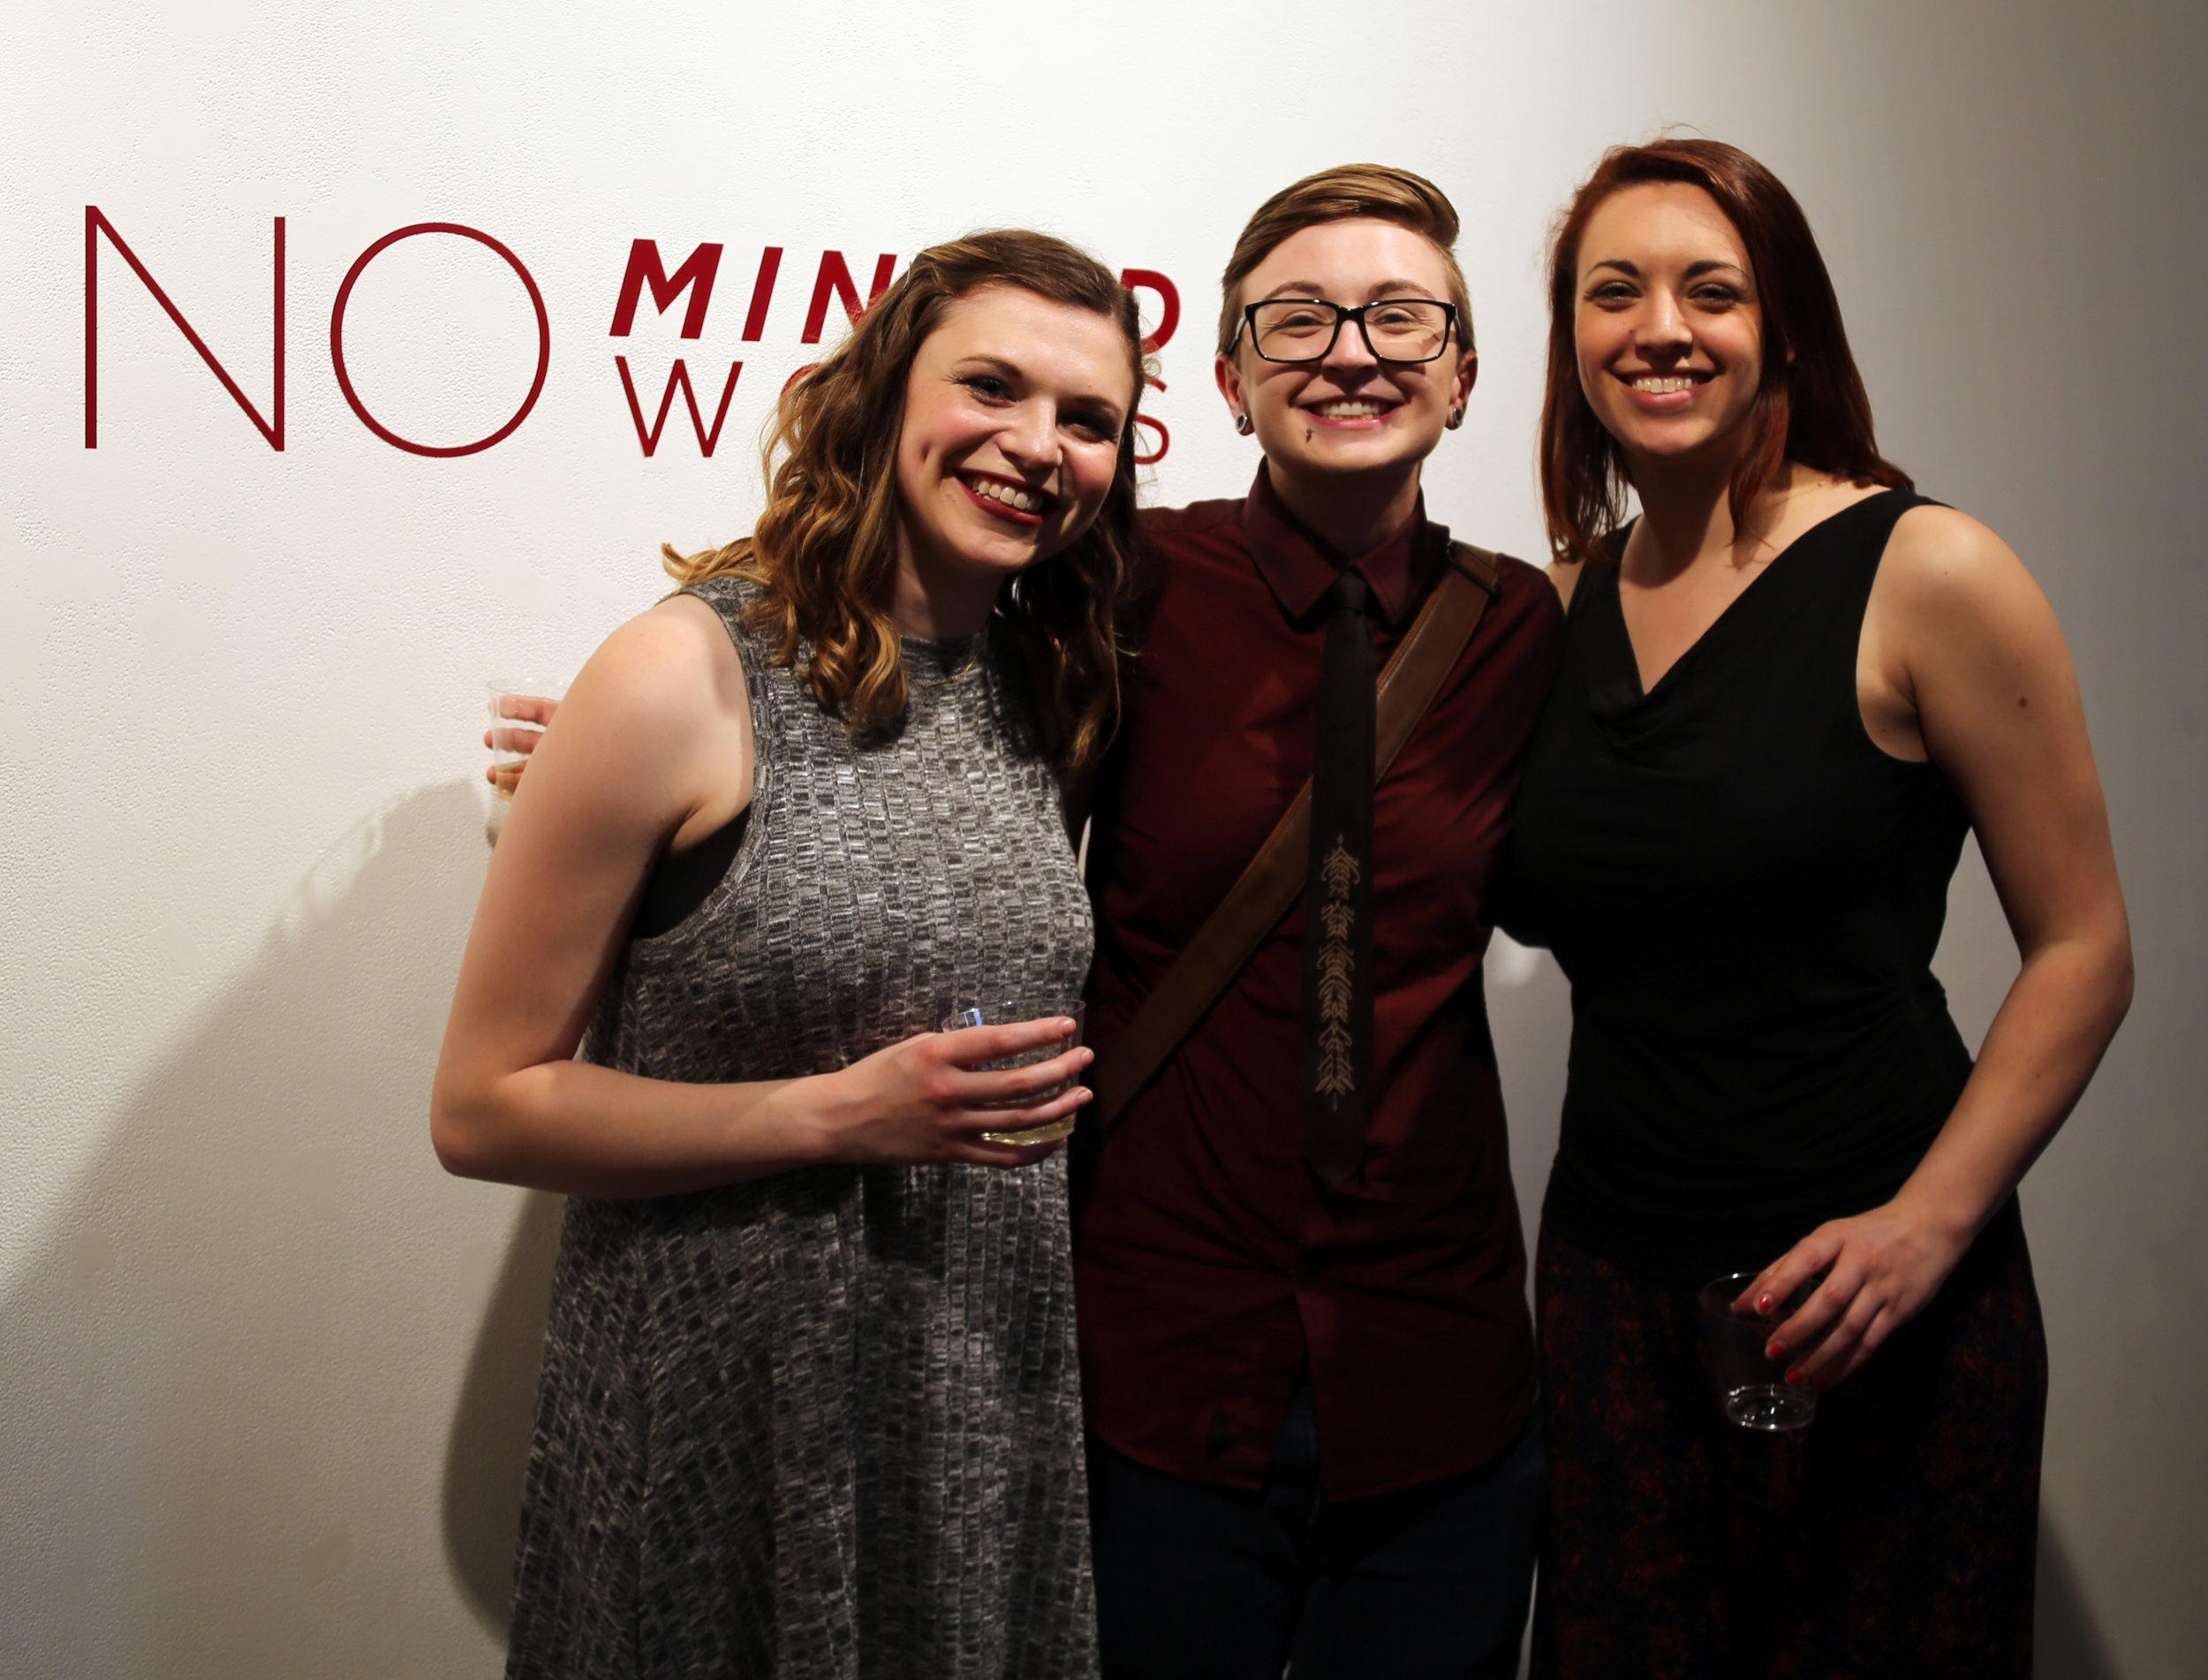 Jess Vandenberg (middle), FEMMEmphis logo and No Minced Words graphic designer